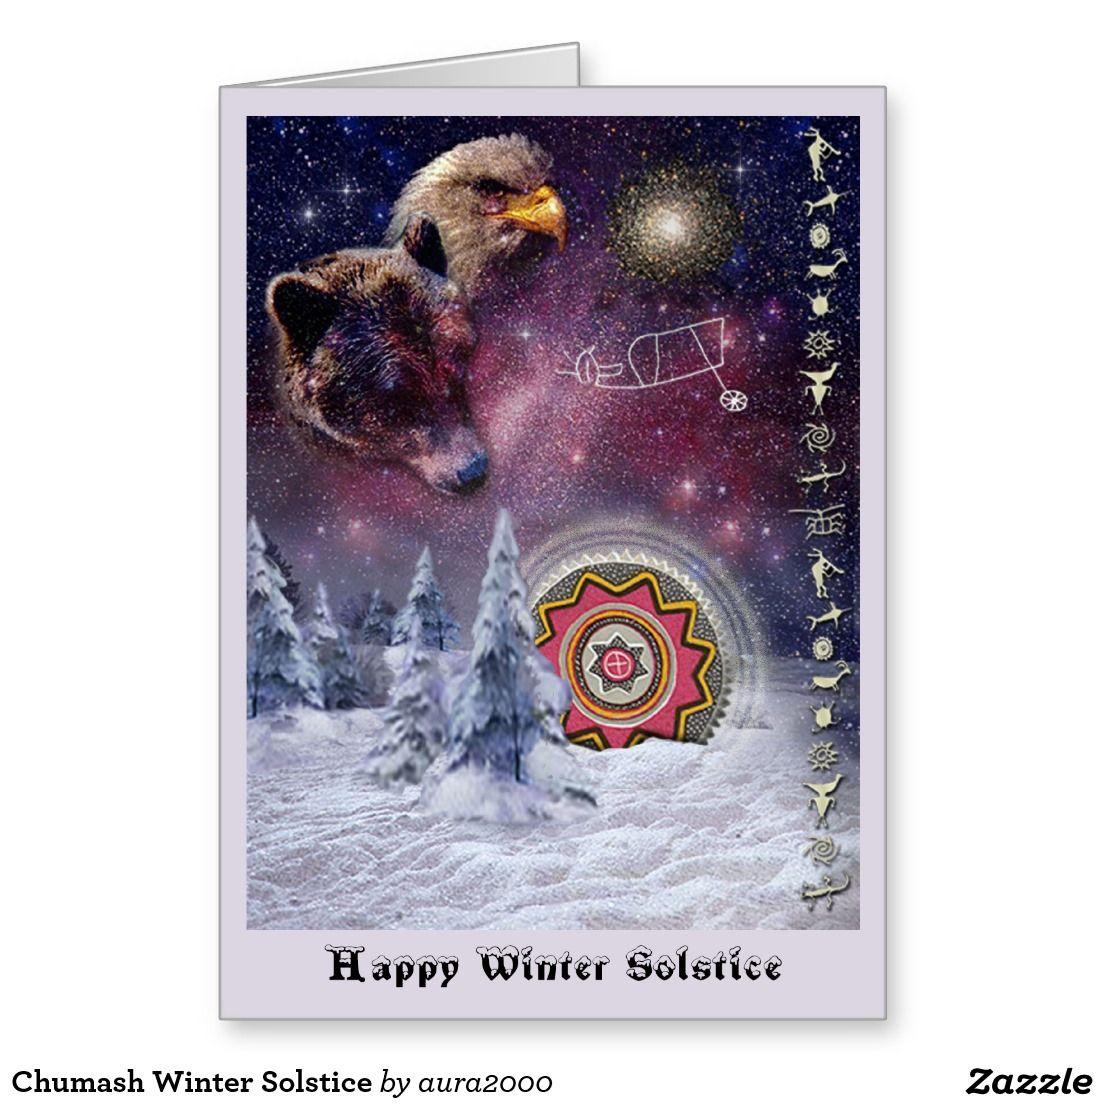 Chumash Winter Solstice Greeting Card Stuff Sold On Zazzle